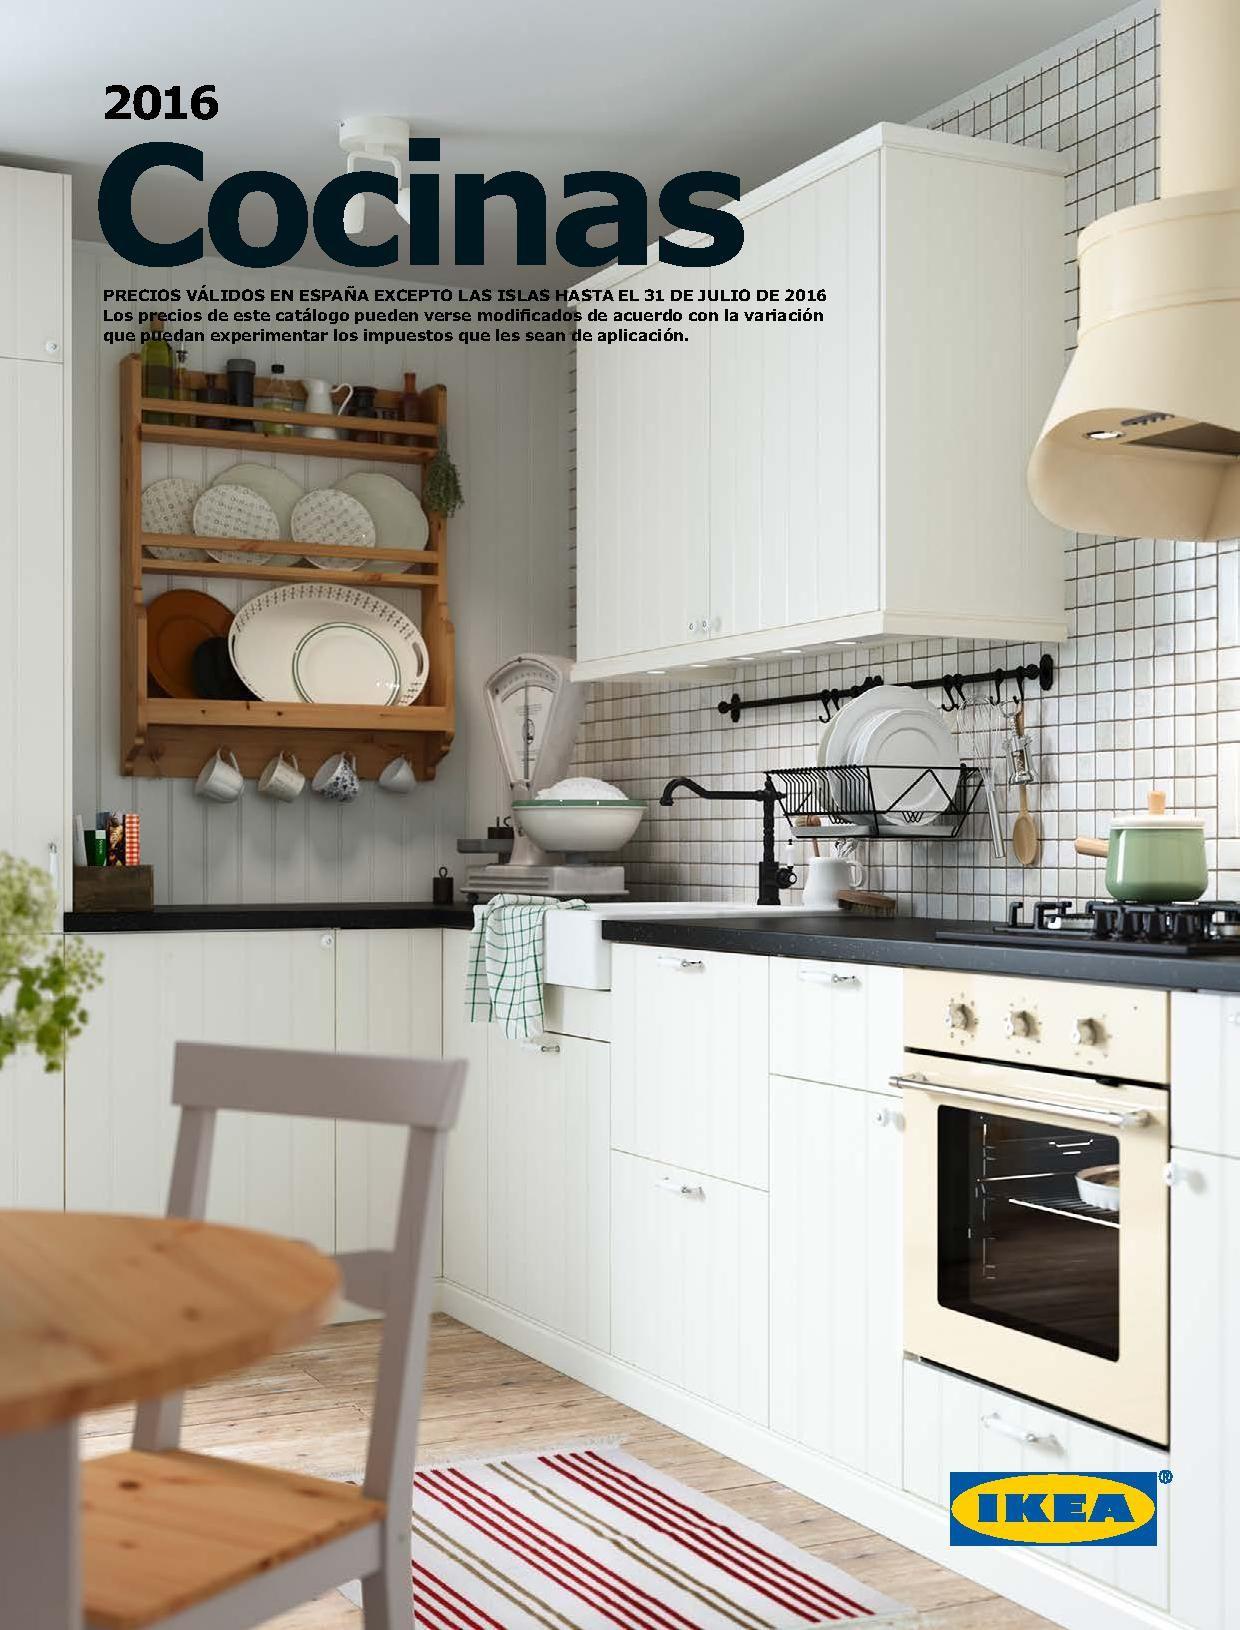 Muebles De Cocina De Ikea | Fotos Cocinas Ikea 2015 1 Deco Canpi Pinterest Cocina Ikea